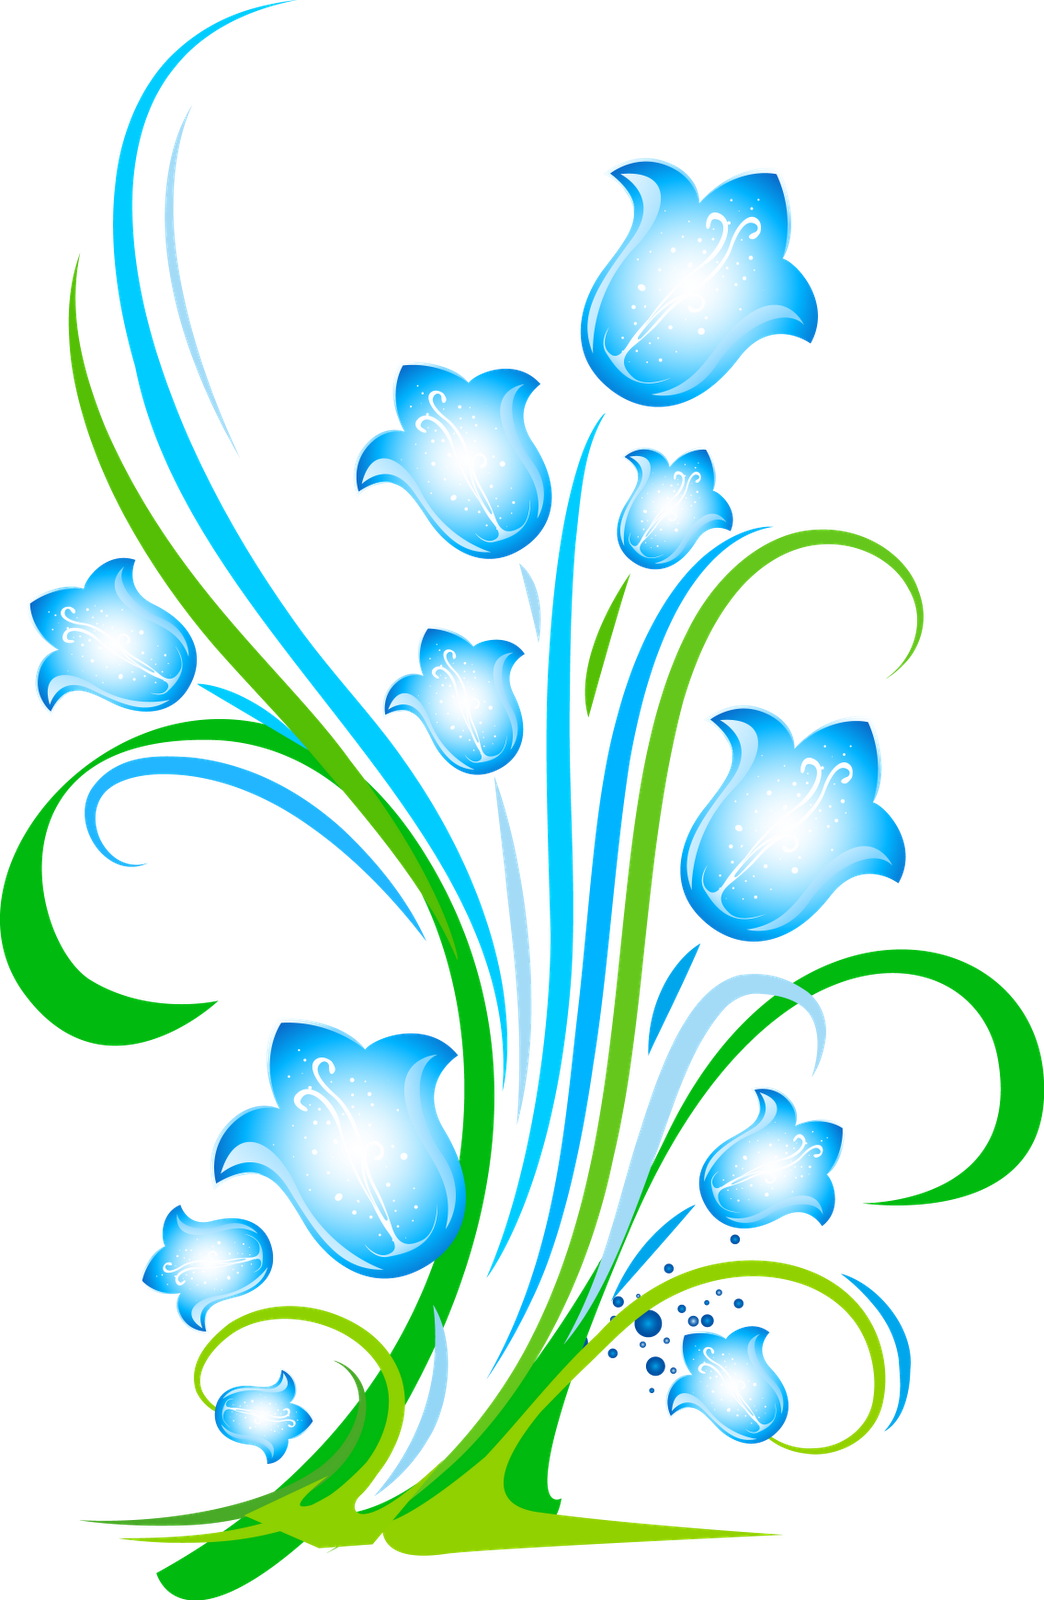 ADOBE PHOTOSHOP .PNG , FLORAL , FLORAL FLOWER.PNG , HTTP:// - Floral PNG